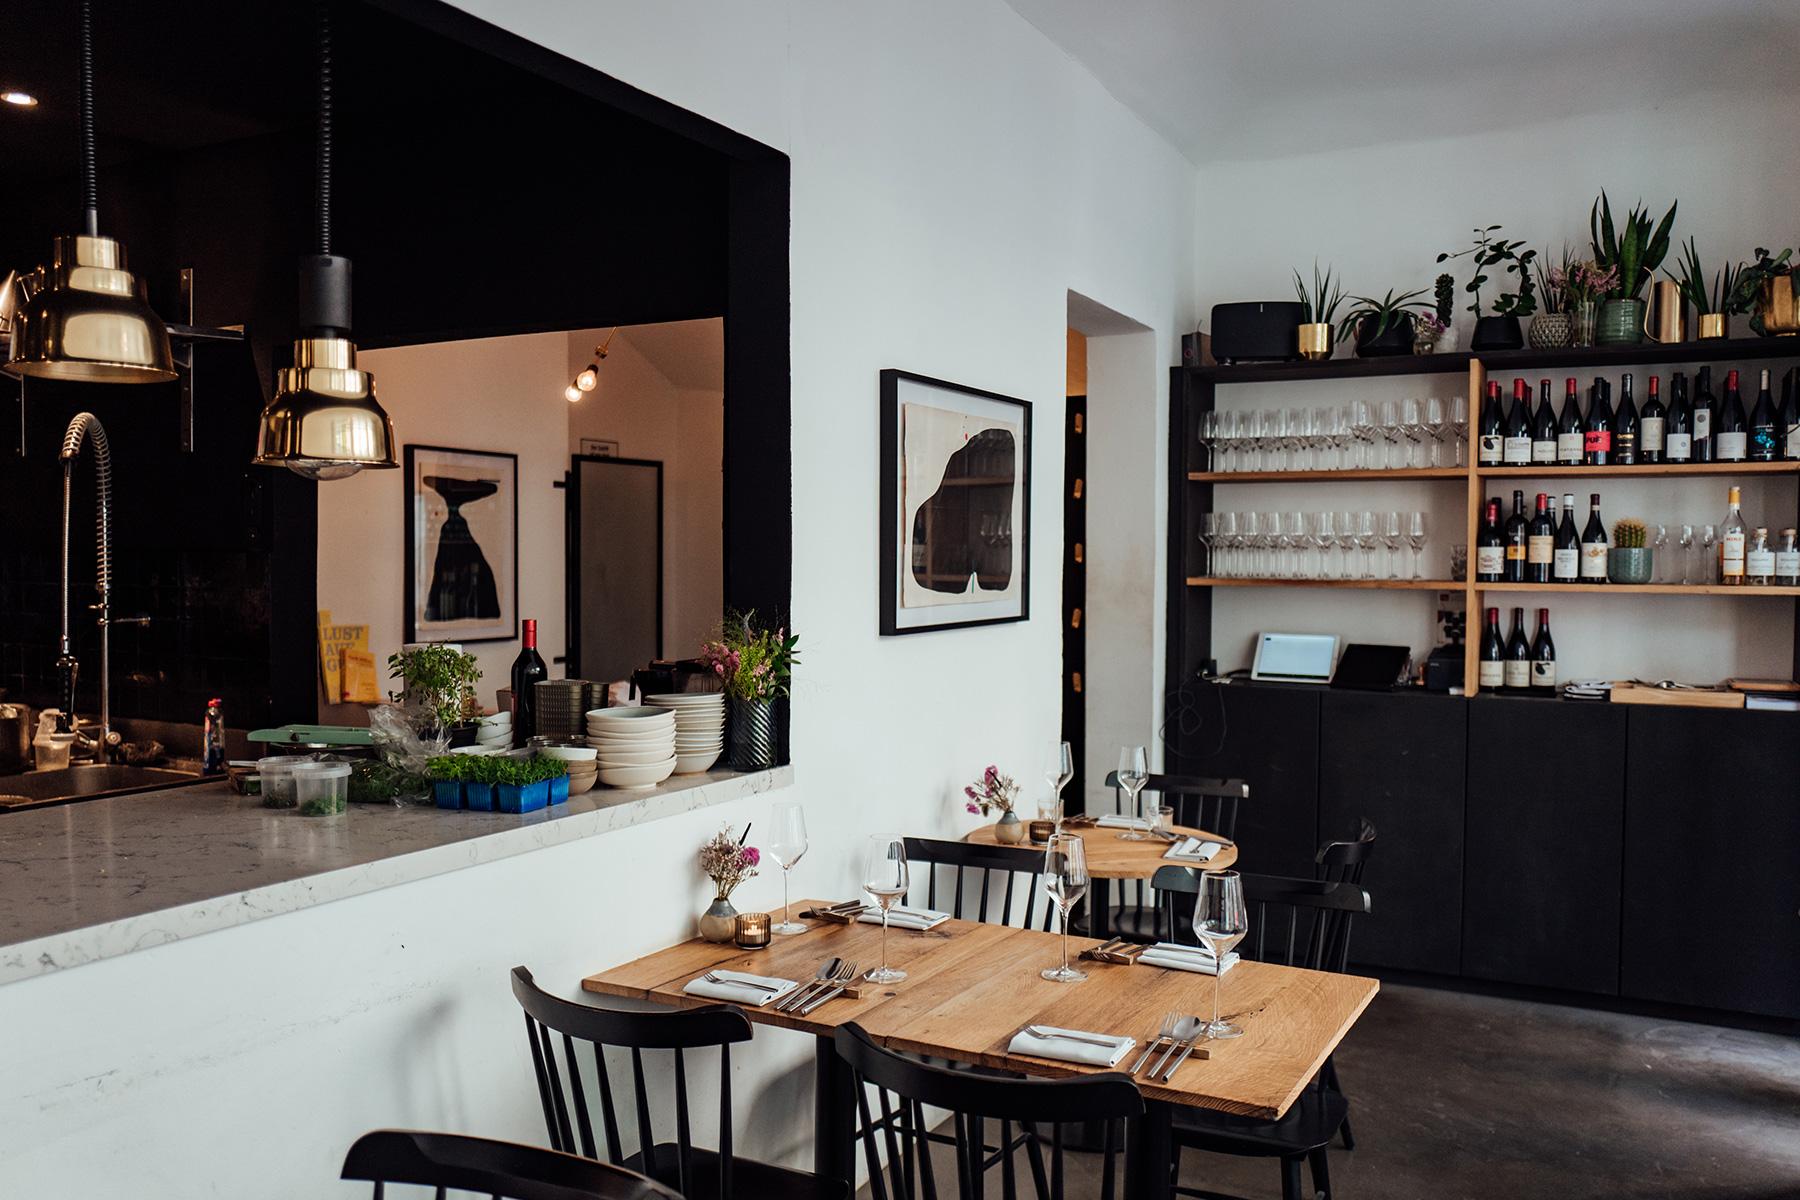 Geheimtipp Hamburg St Pauli Restaurant Haebel Lisa Knauer 5